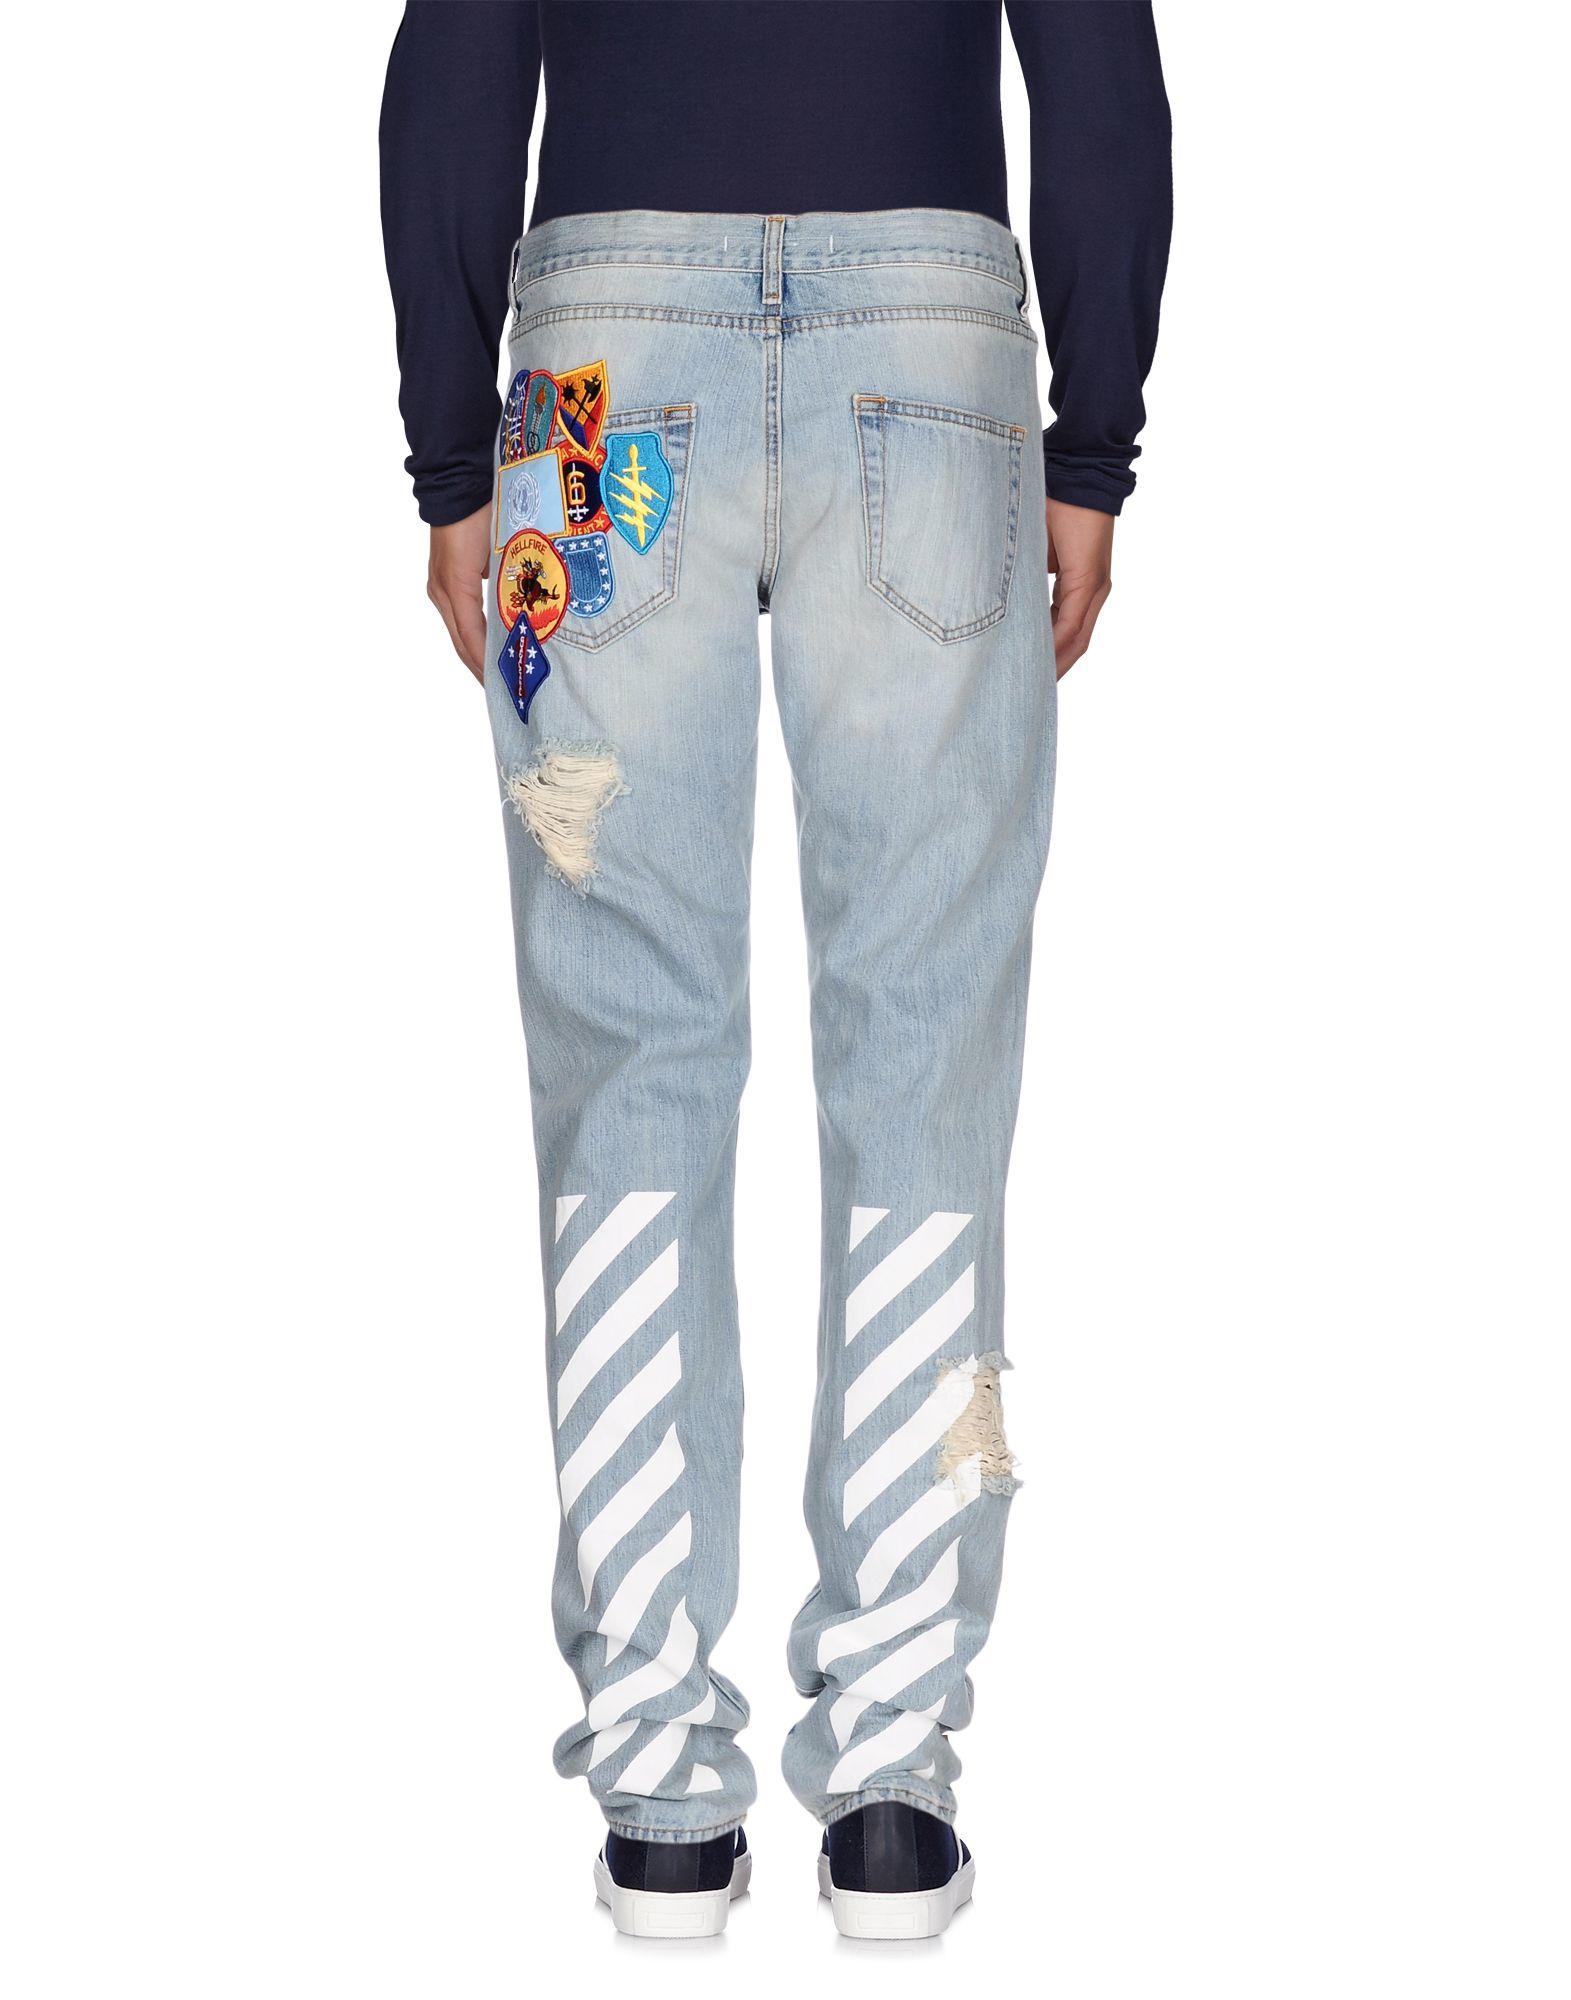 Off-white c/o virgil abloh Straight-Leg Embroidered Denim Jeans in ...